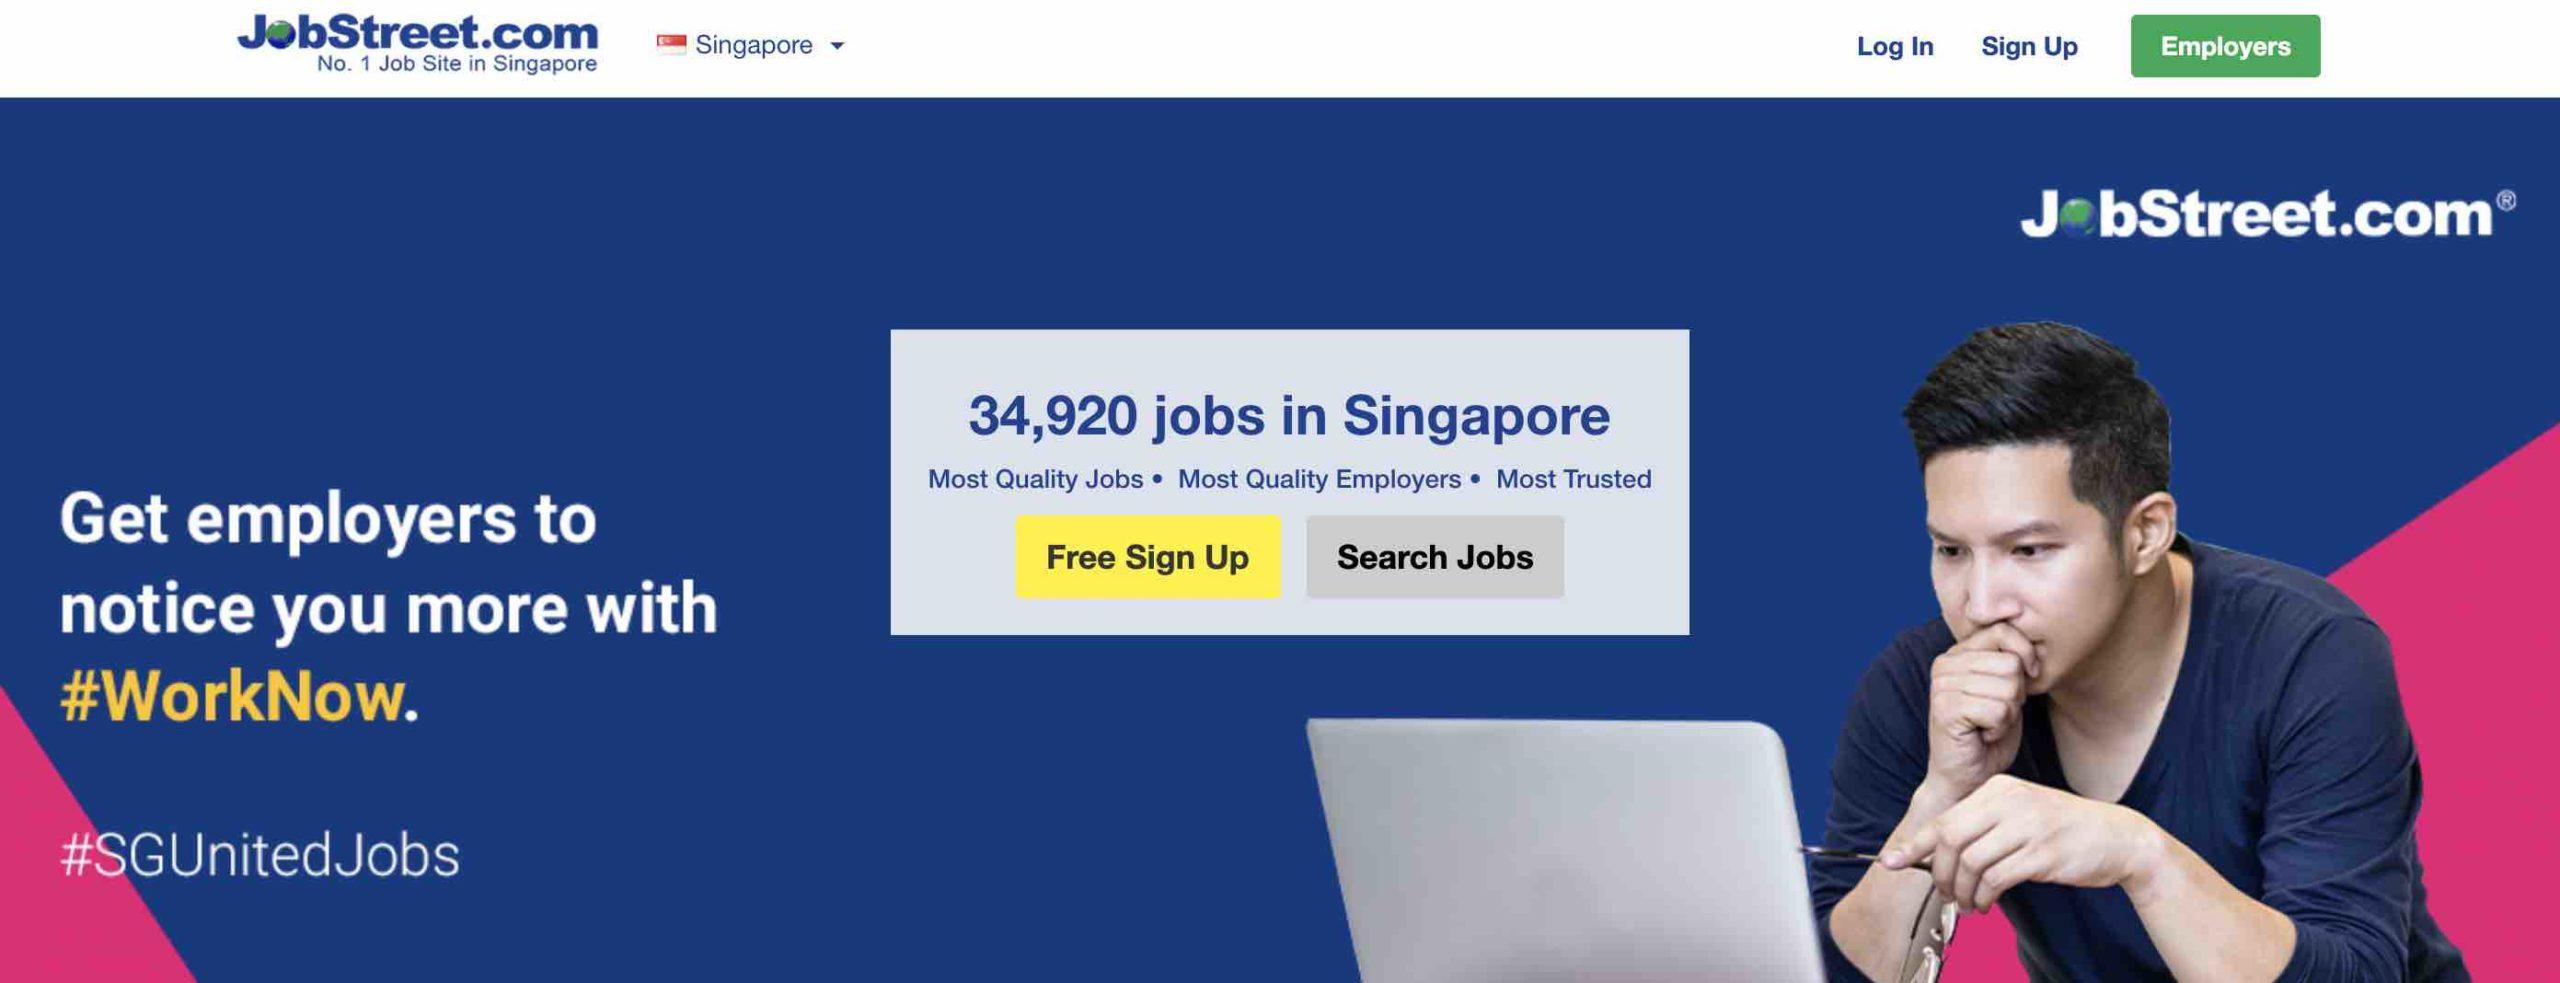 JobStreet Singapore